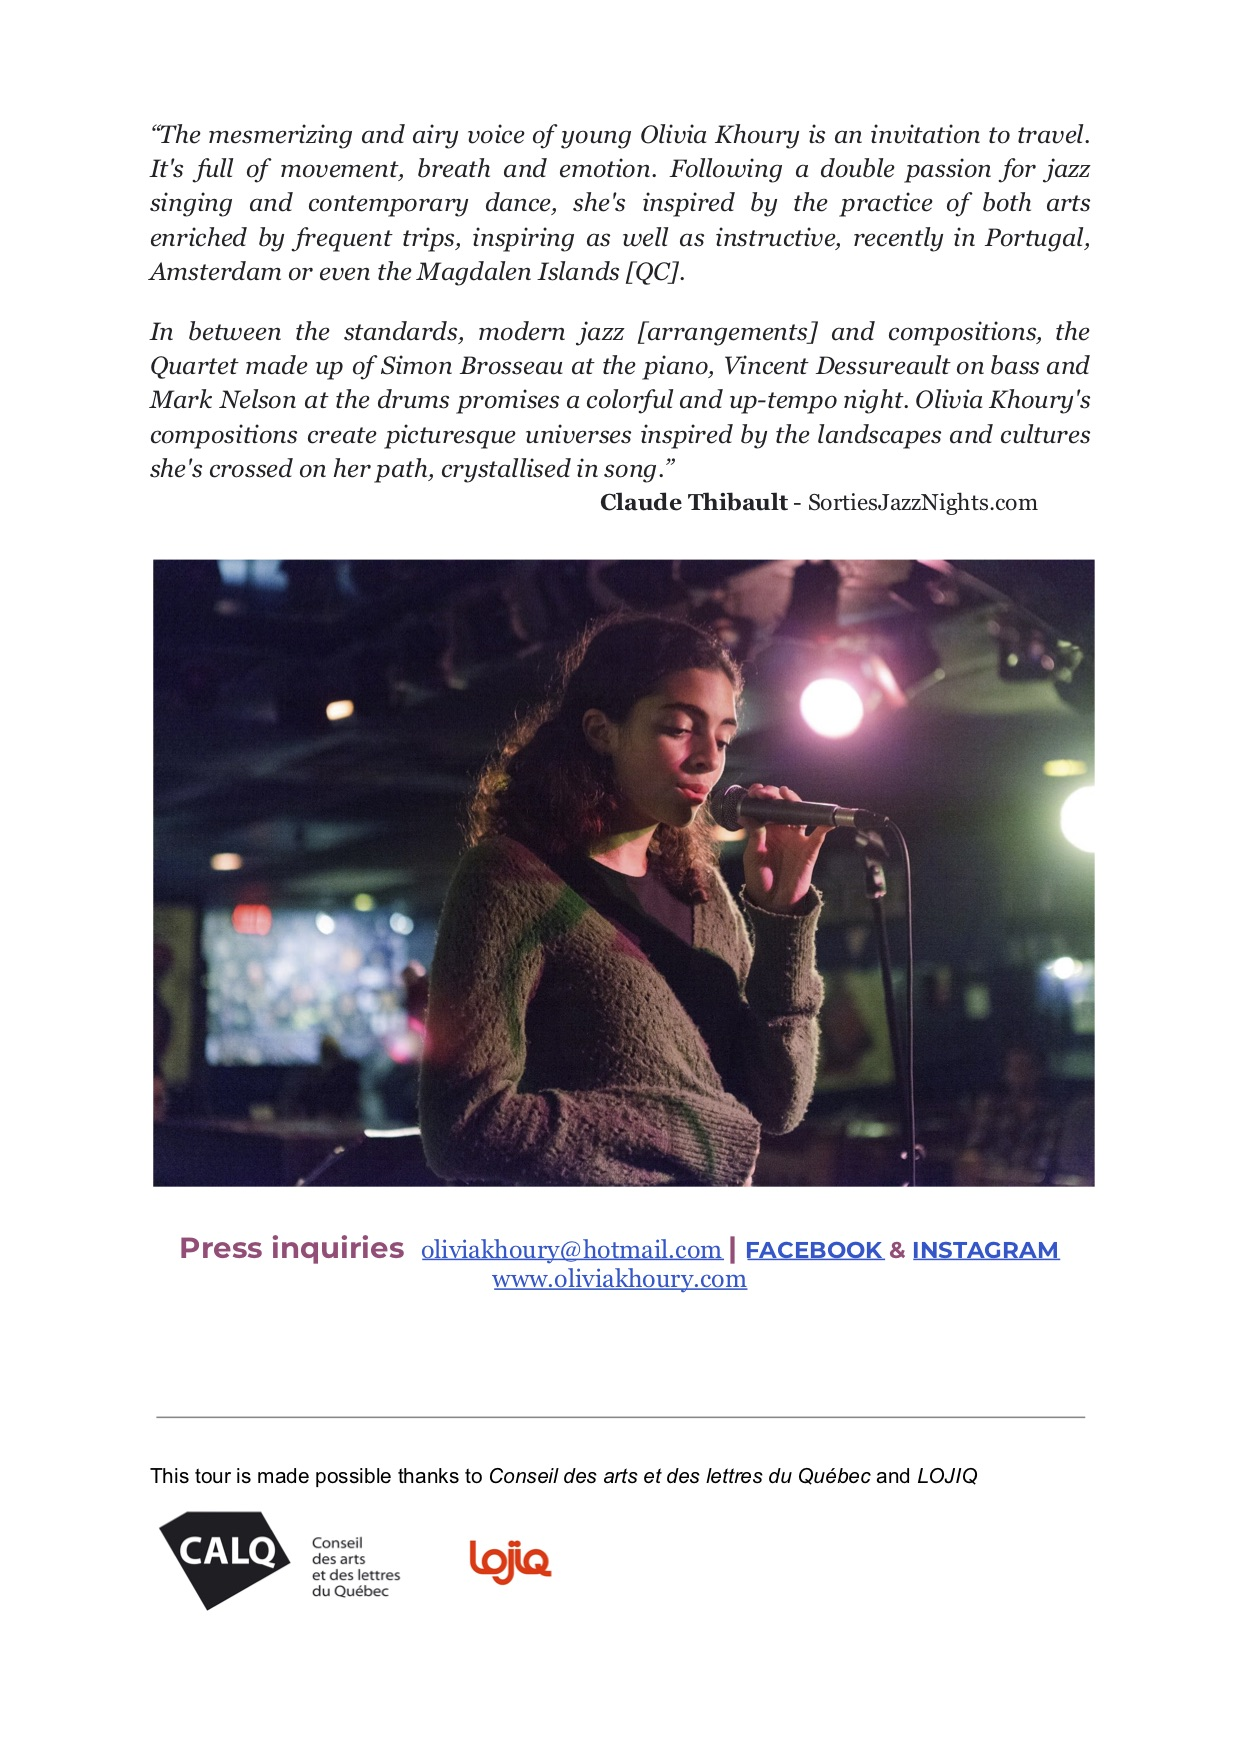 PRESS RELEASE OLIVIA KHOURY TOUR TORONTO 1.jpg